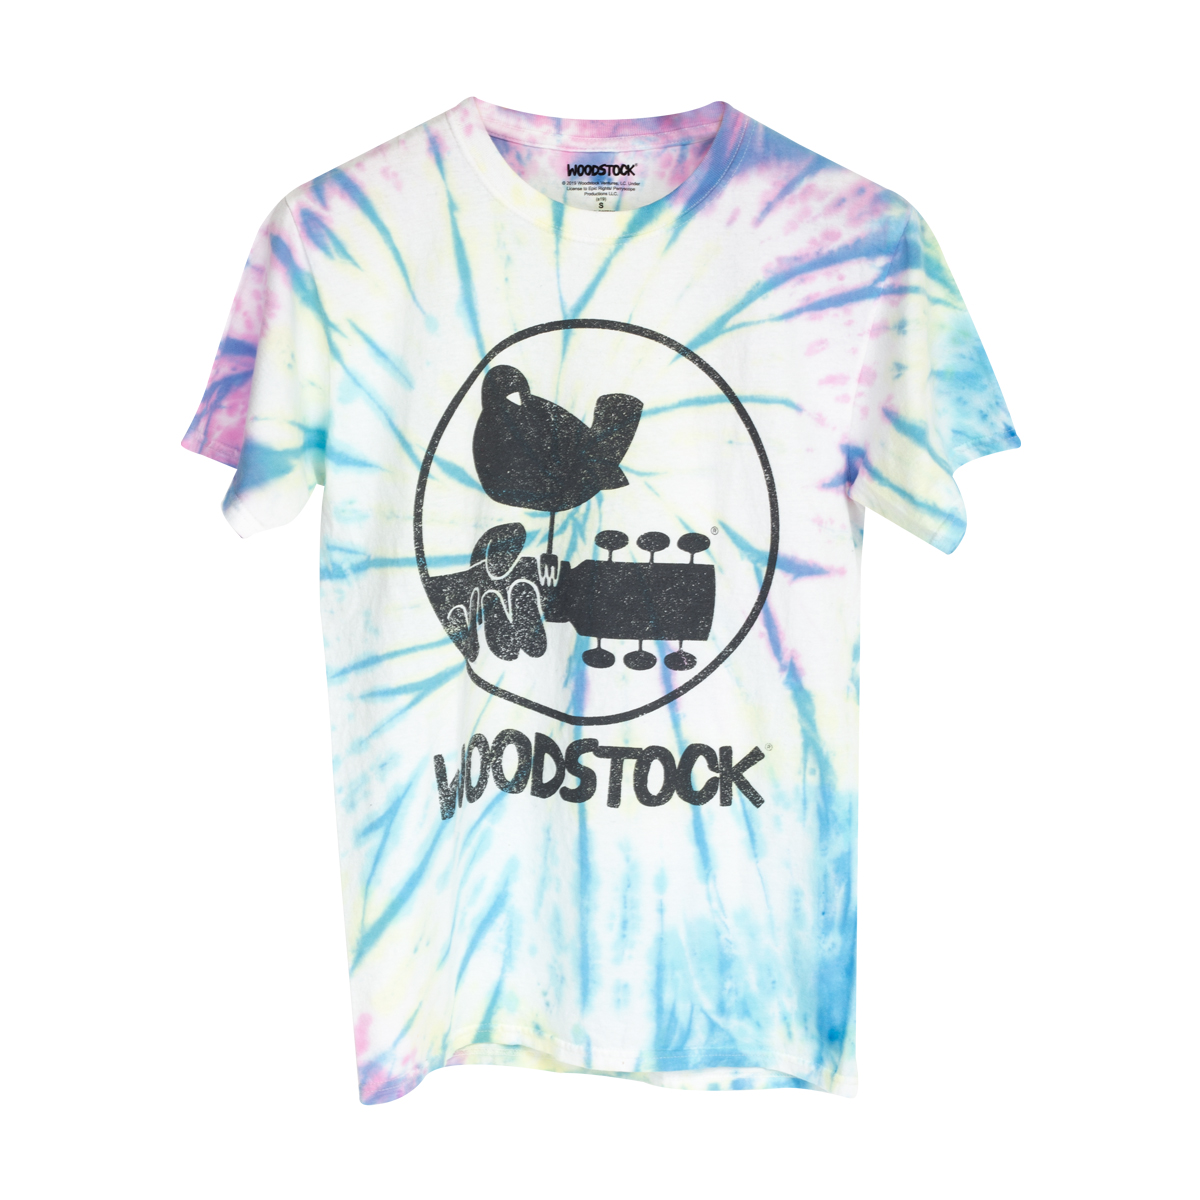 Woodstock Circular Logo Tie Dye T-Shirt